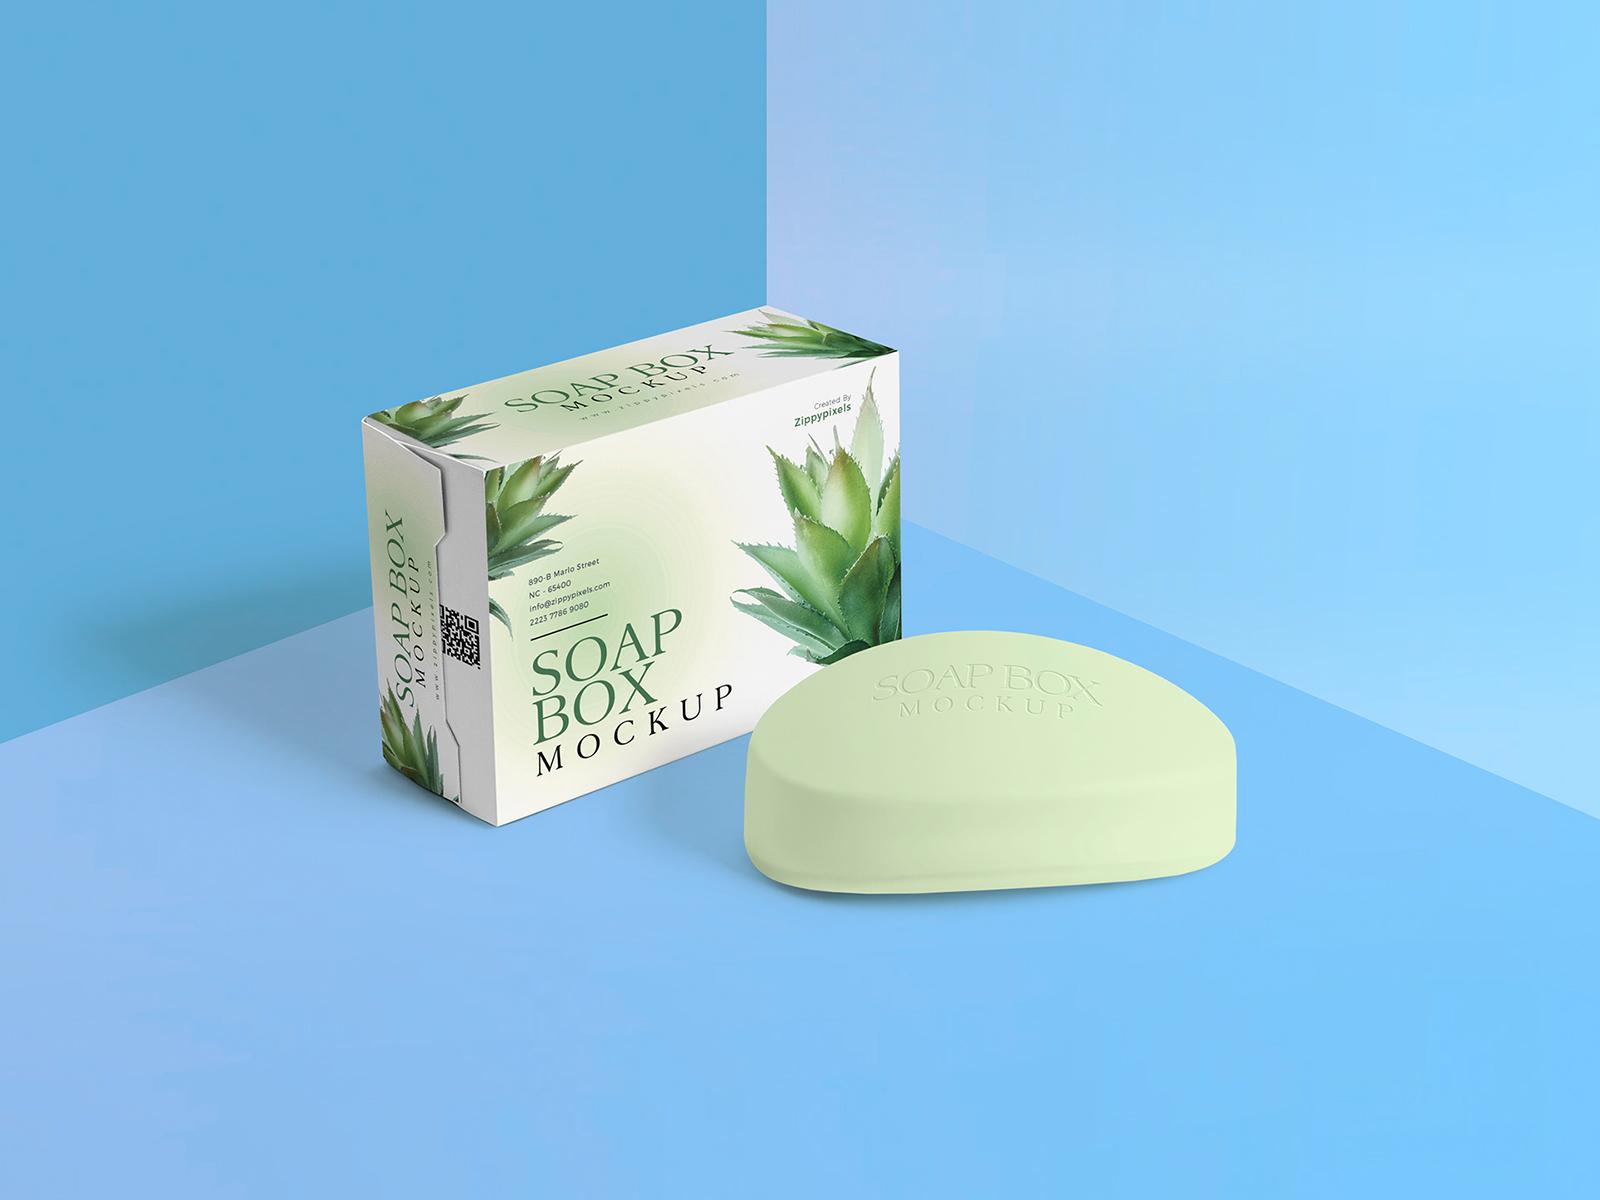 Packaging Box & Soap Free Mockup